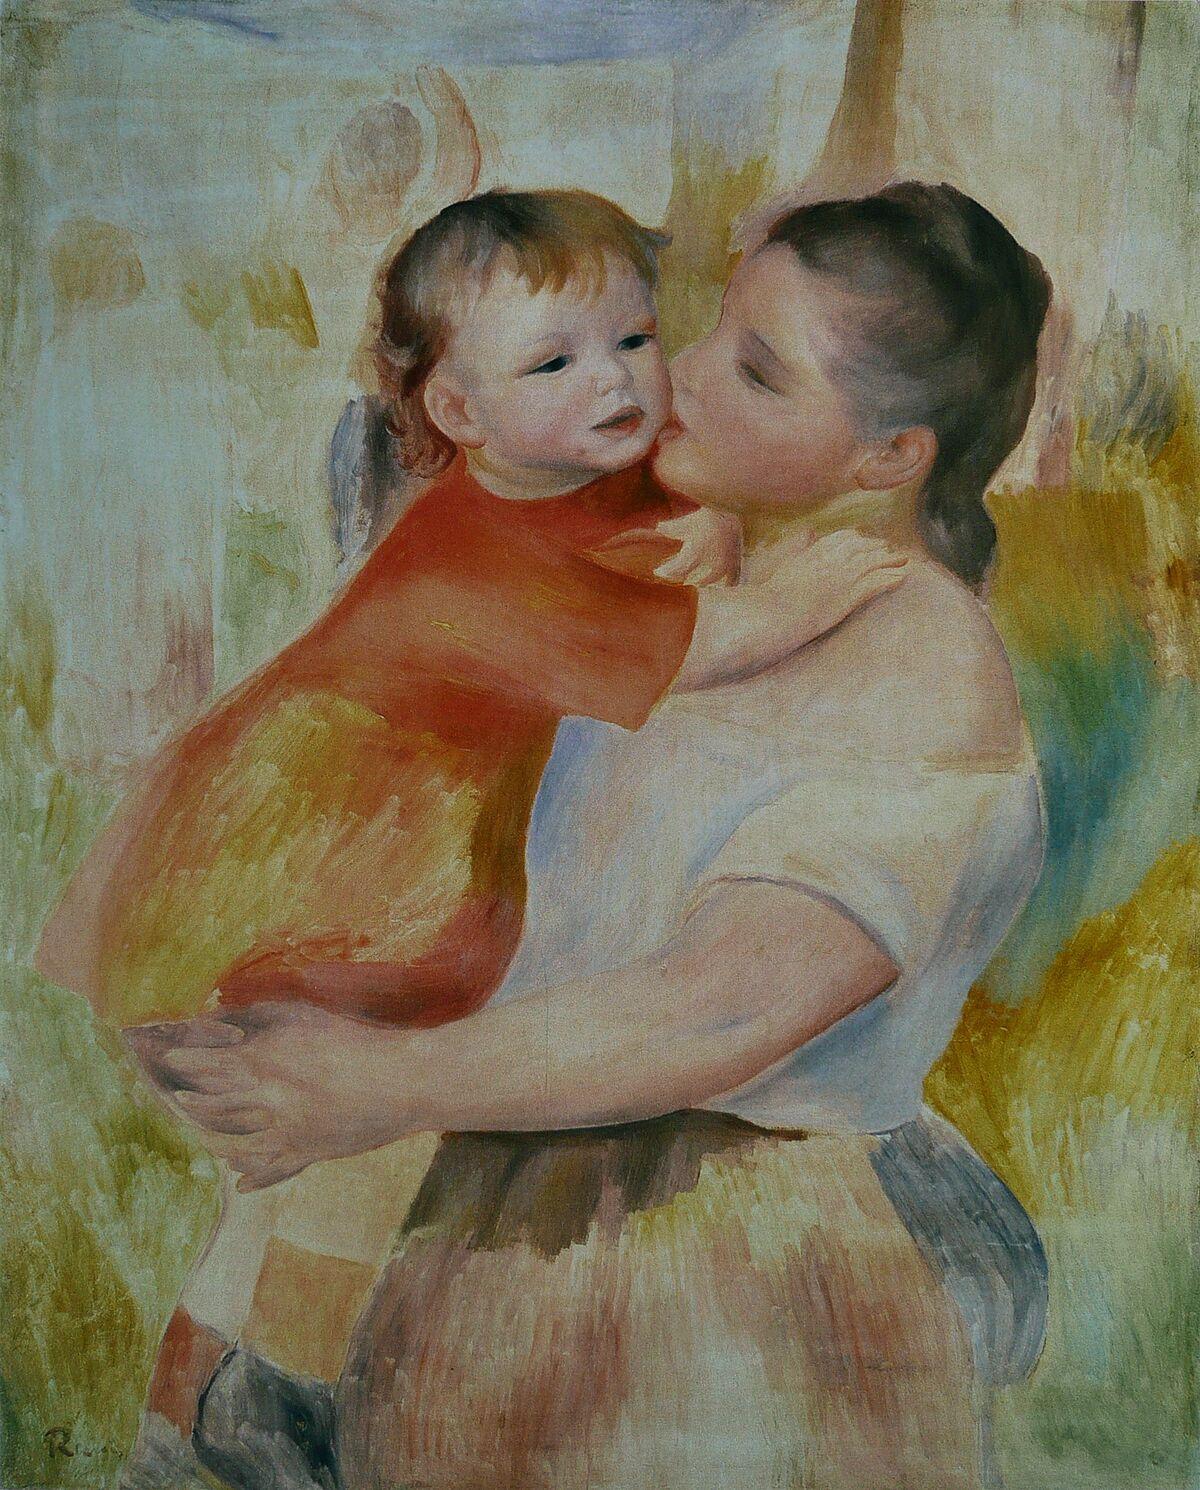 Pierre-Auguste Renoir, Washerwoman and Child, ca. 1887. Image via Wikimedia Commons.